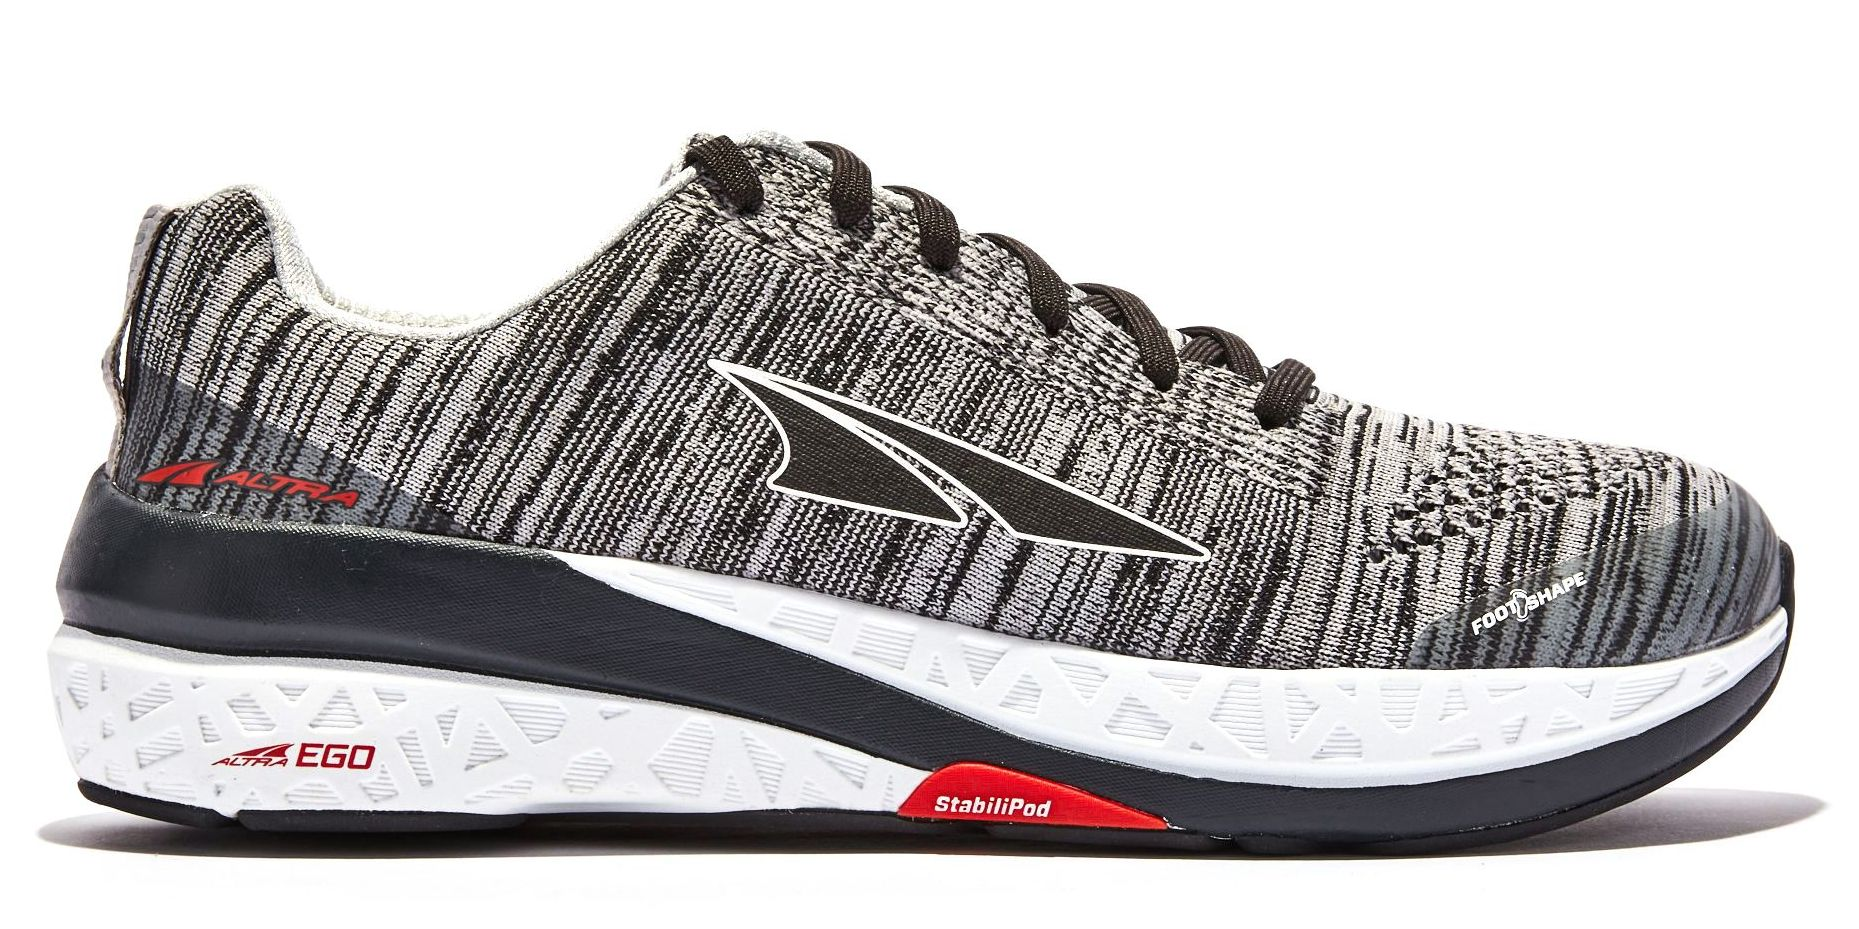 996983cc99dd9 Altra Running Shoes 2019 | Altra Shoe Reviews